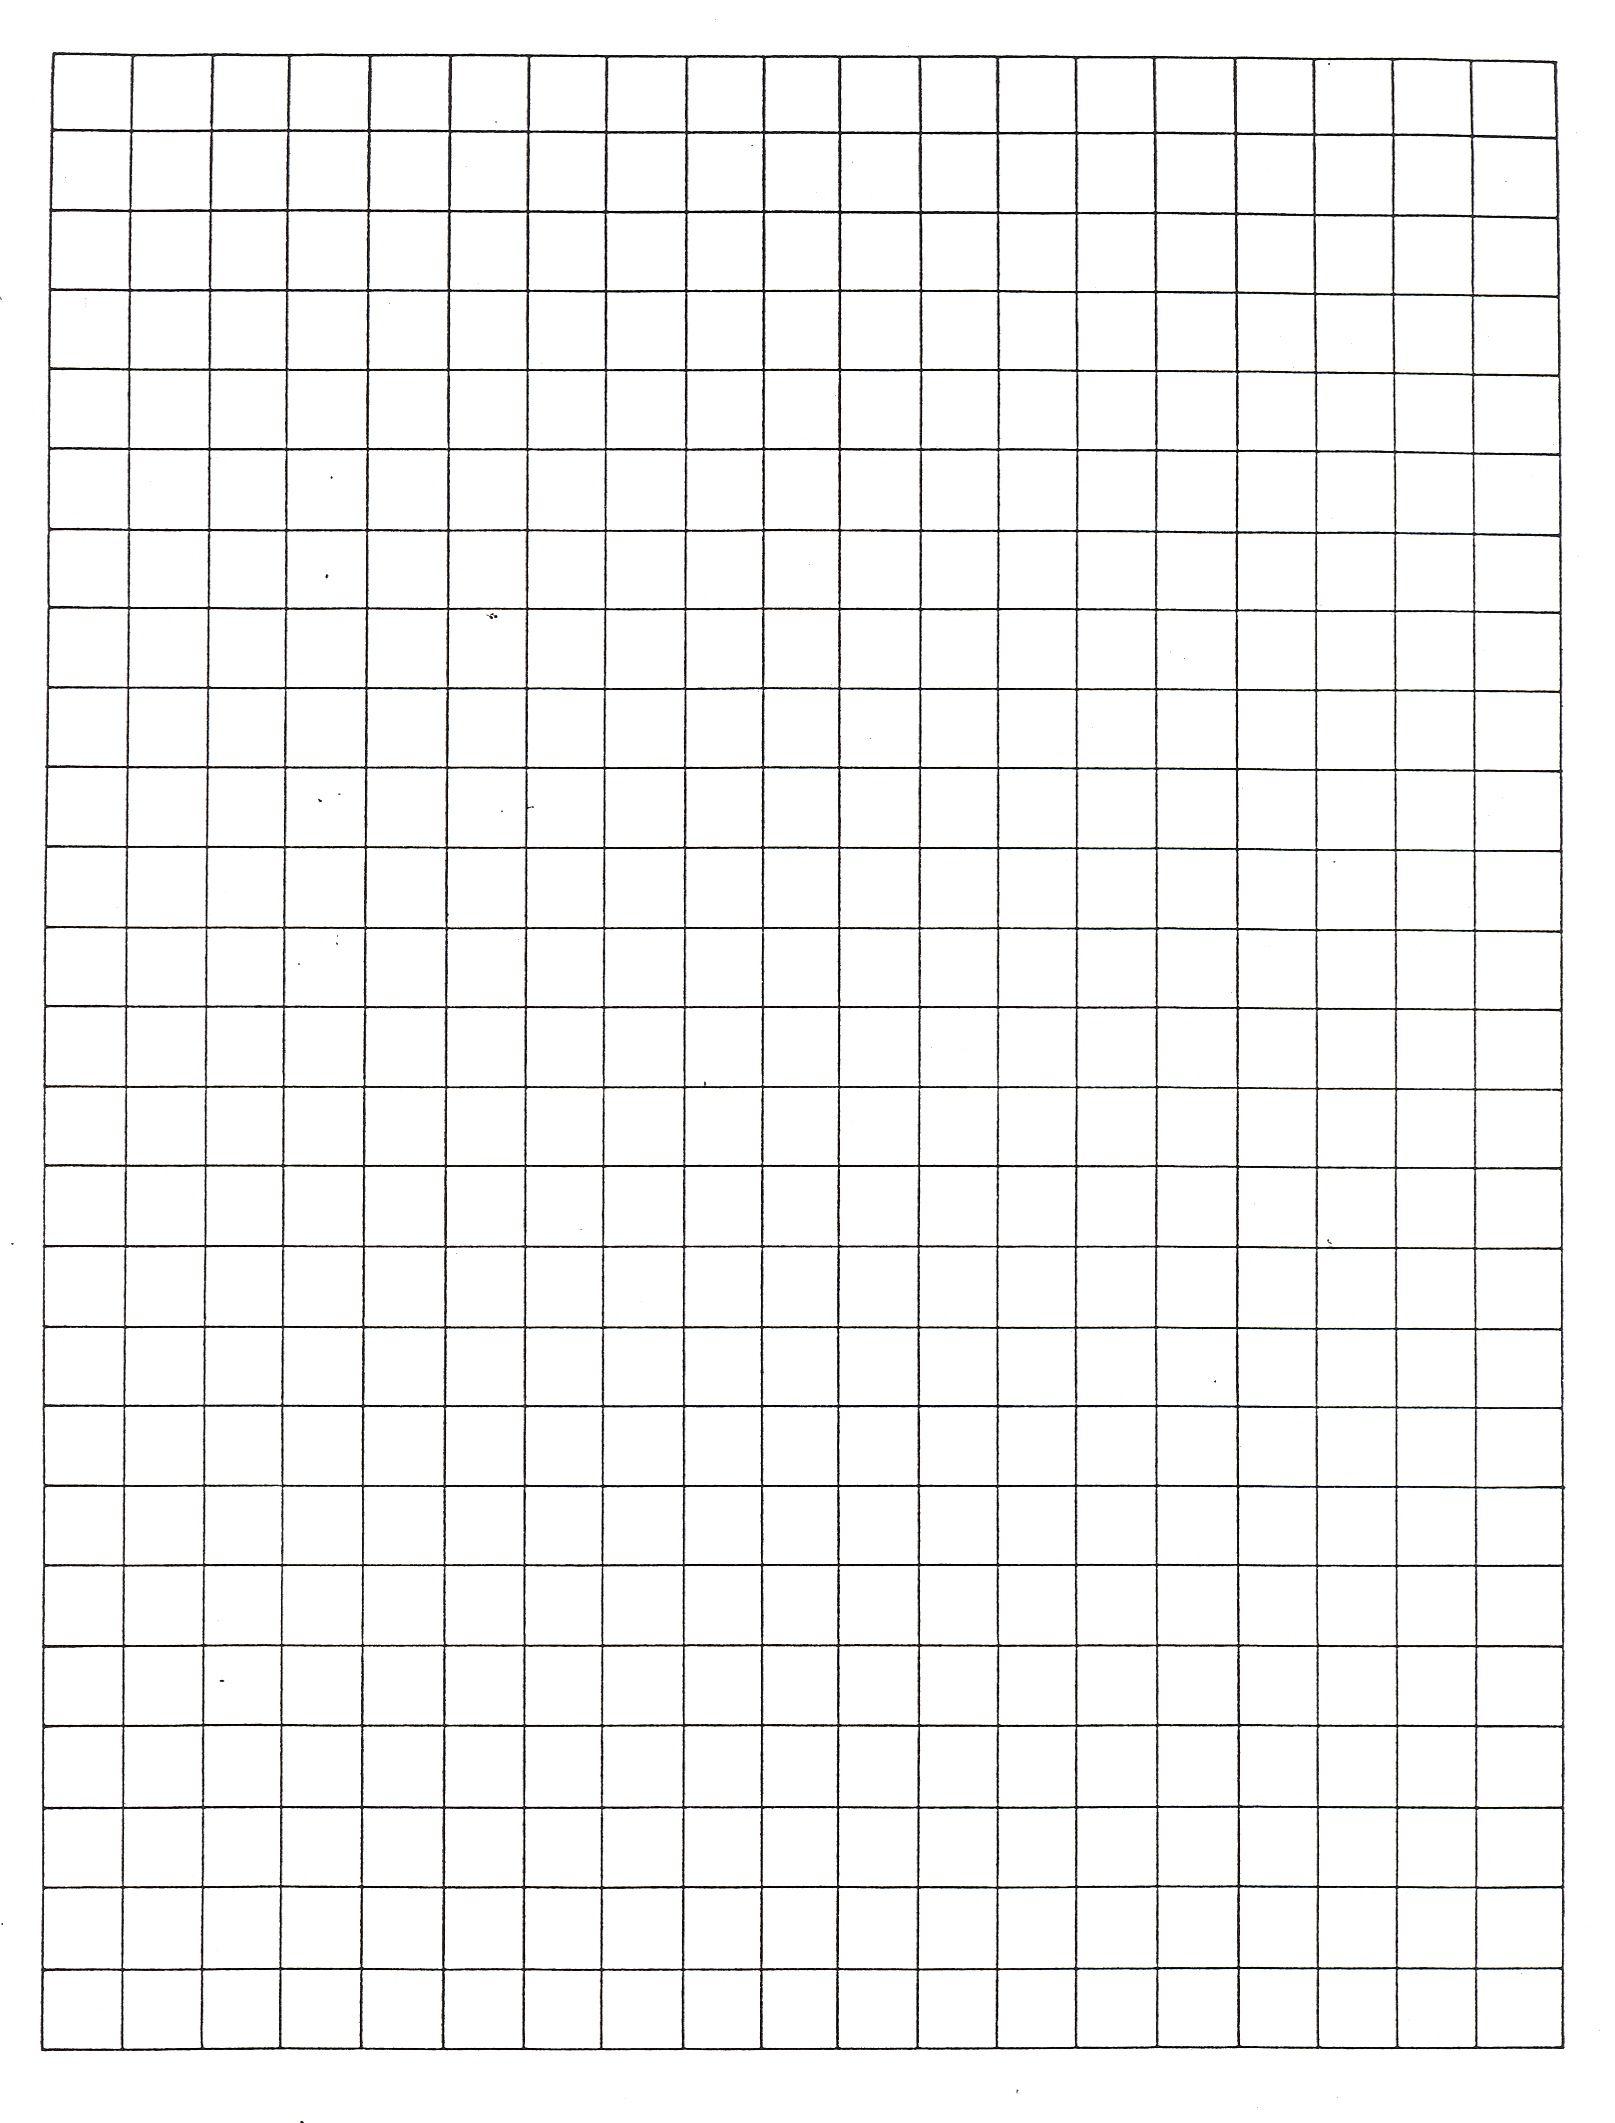 Pin Cm Grid Paper Printable On Pinterest Yq9tmoti Fotografi Hitam Putih